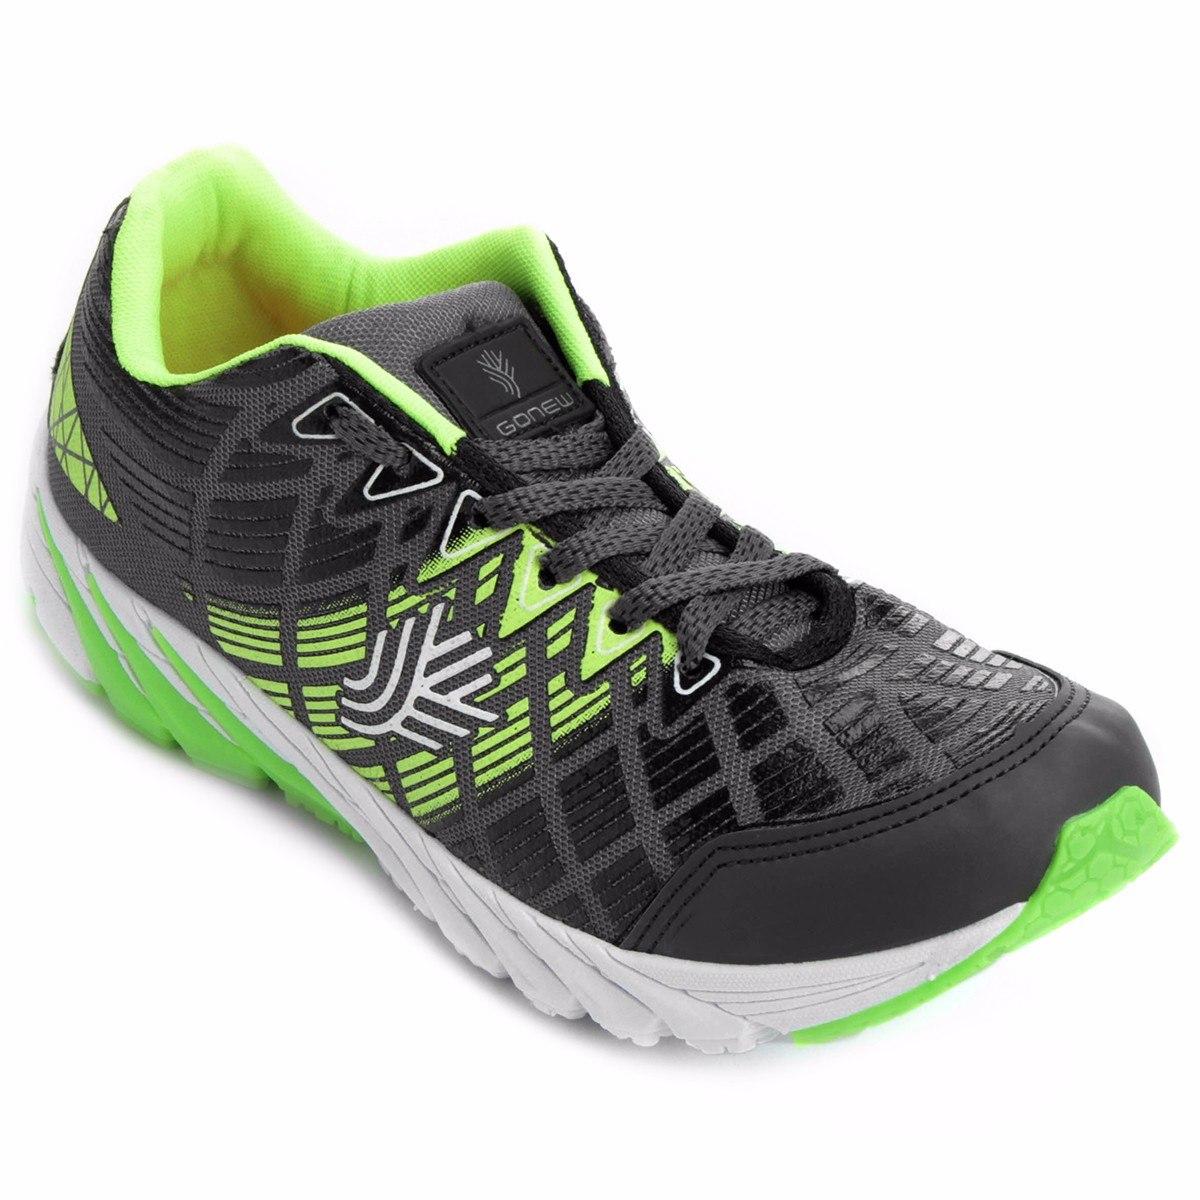 415cd15297c tênis para caminhada corrida running walking - maratona. Carregando zoom.